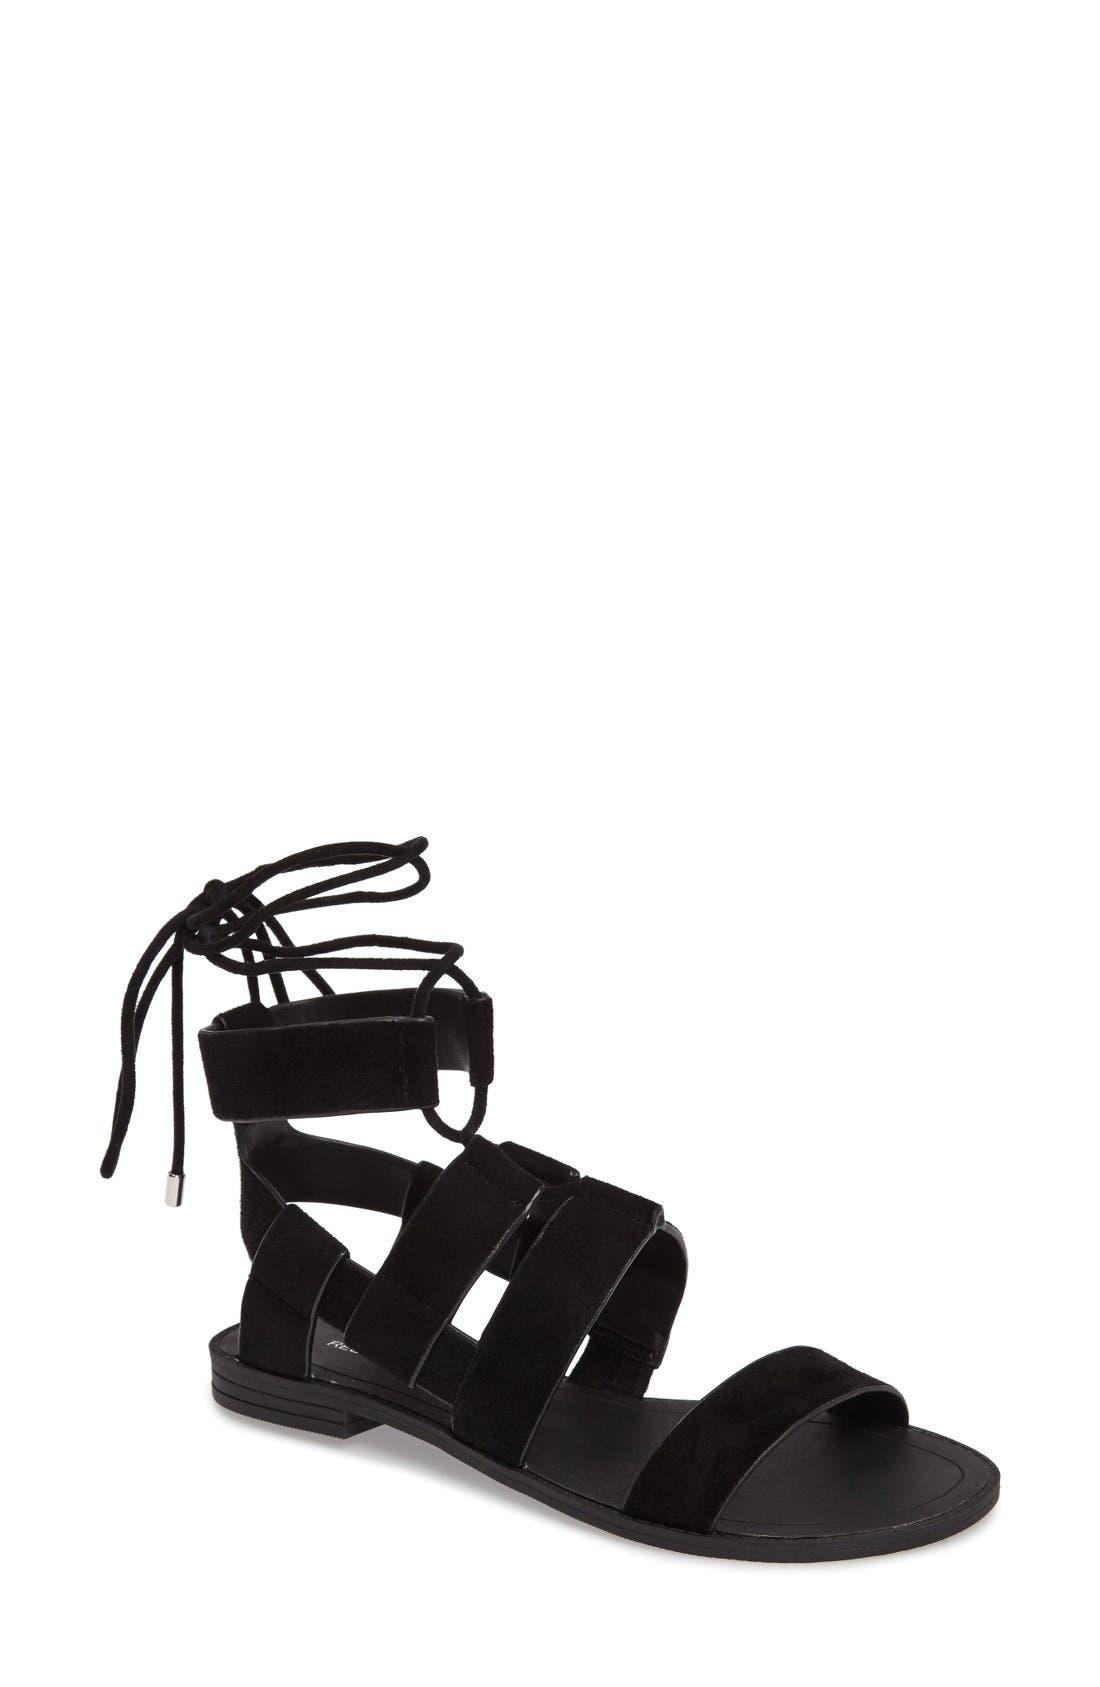 Main Image - Rebecca Minkoff Giada Strappy Sandal (Women)